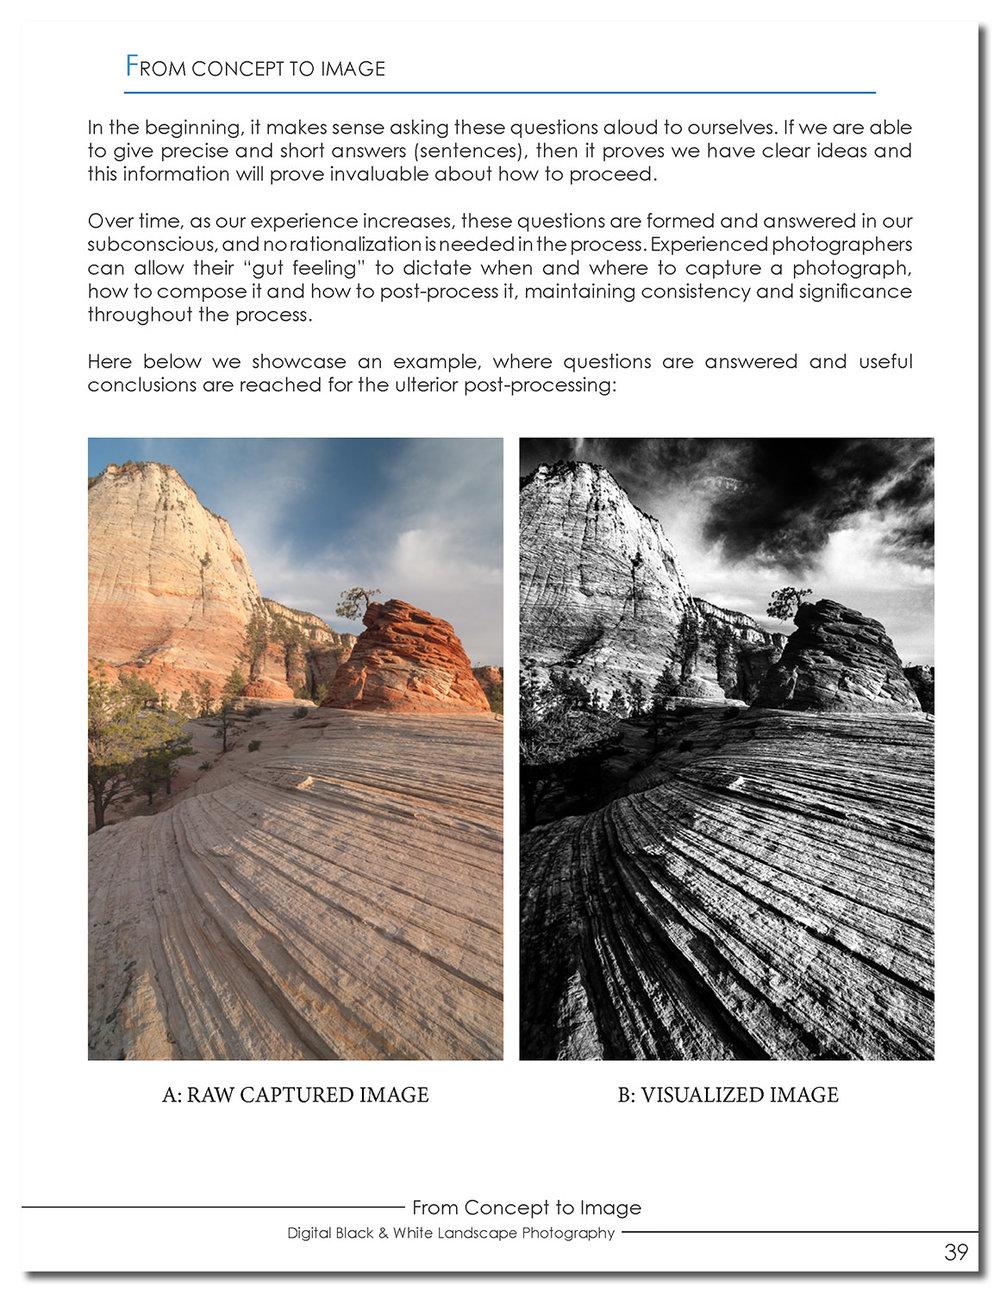 Digital_Black_White_Landscape_Photography_I_The_Ebook_Page_39.jpg